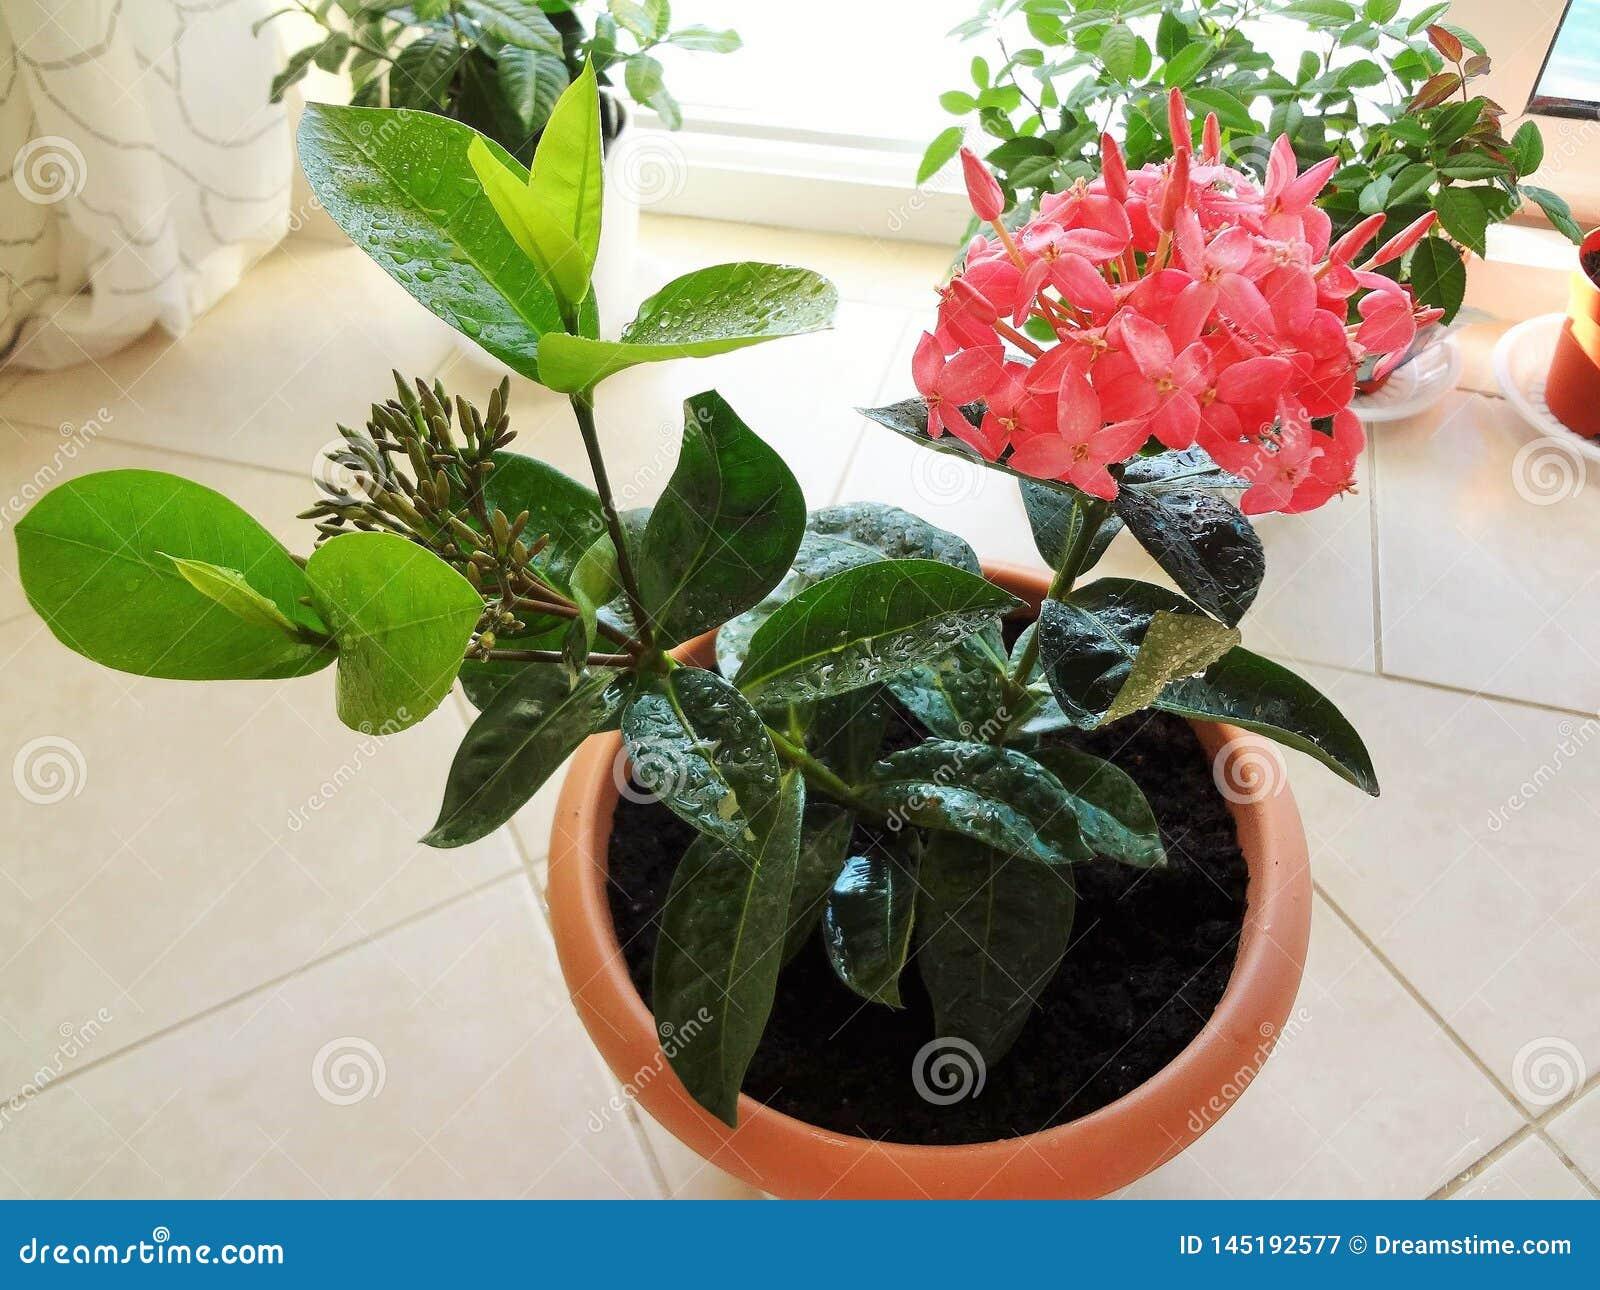 Amazing blooming pink ixora tropical evergreen shrub in pot